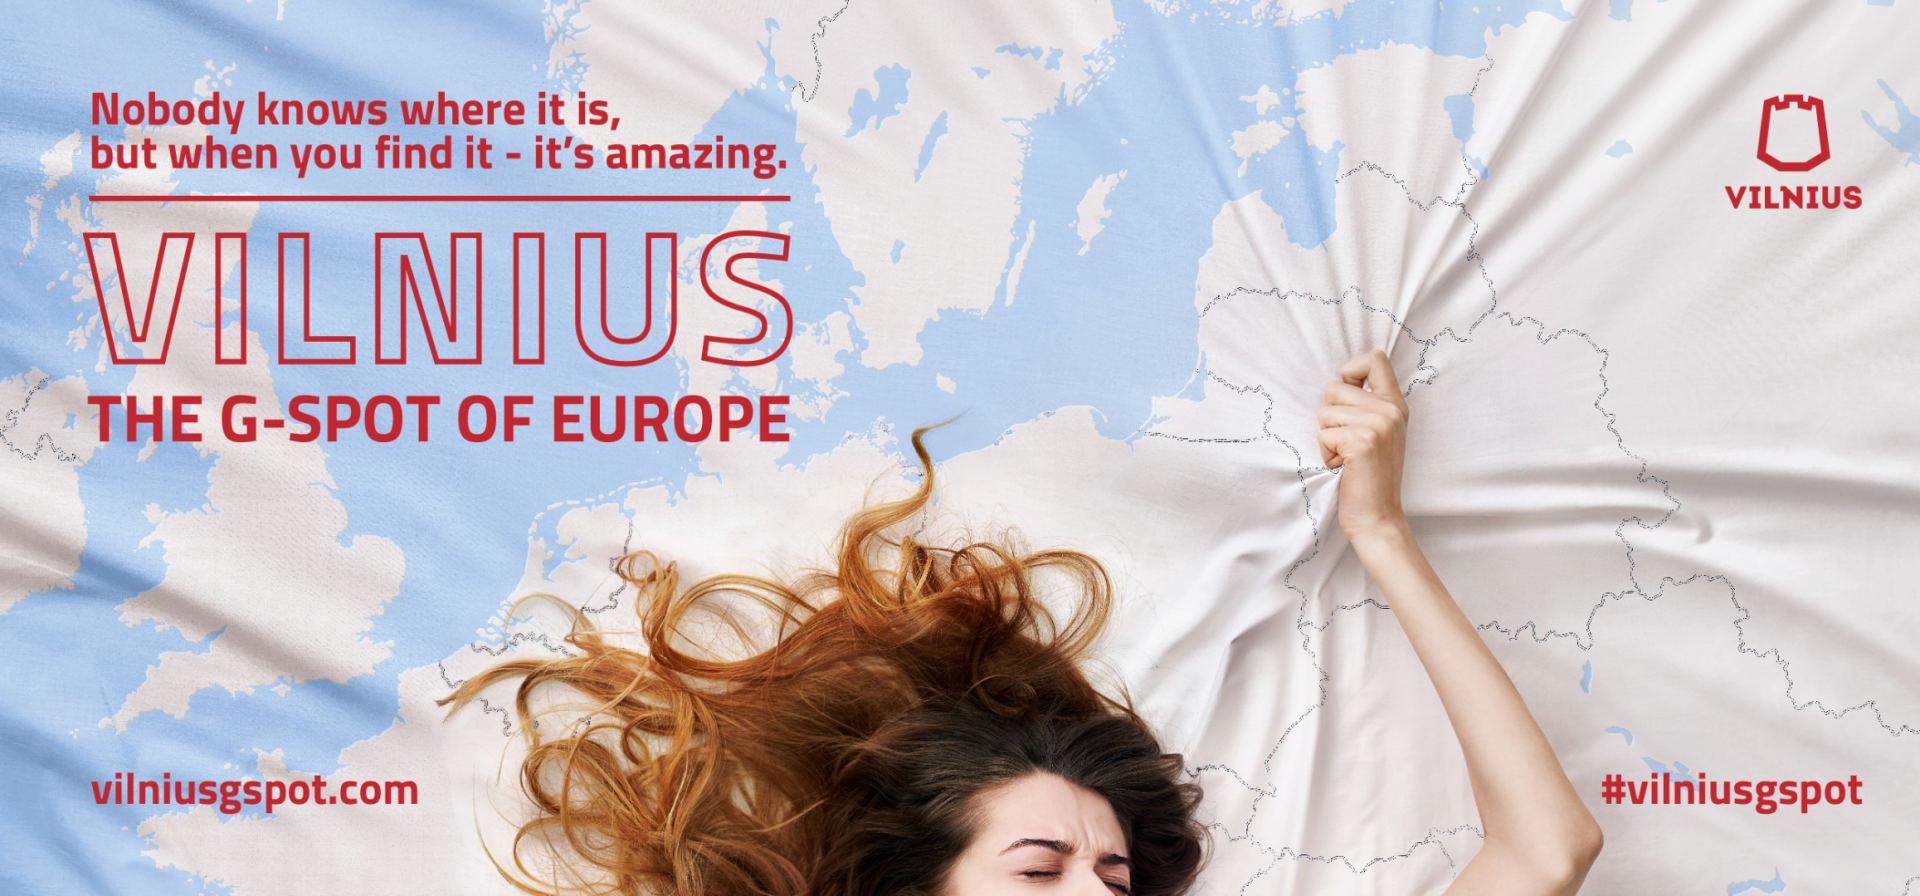 Рекламный плакат Вильнюса